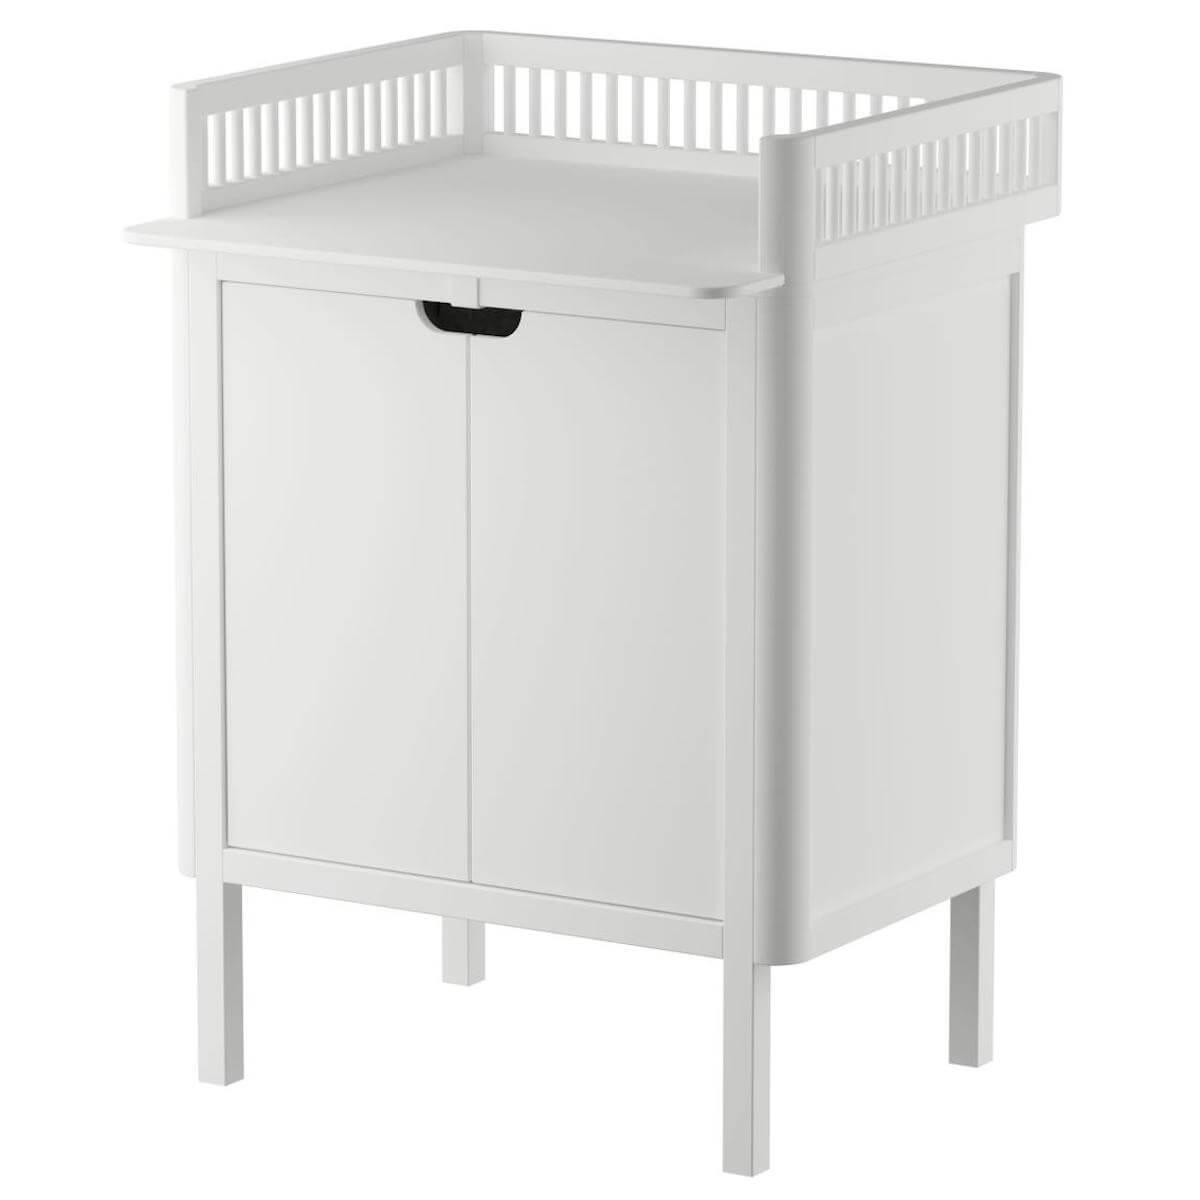 Table à langer 2 portes Sebra classic white